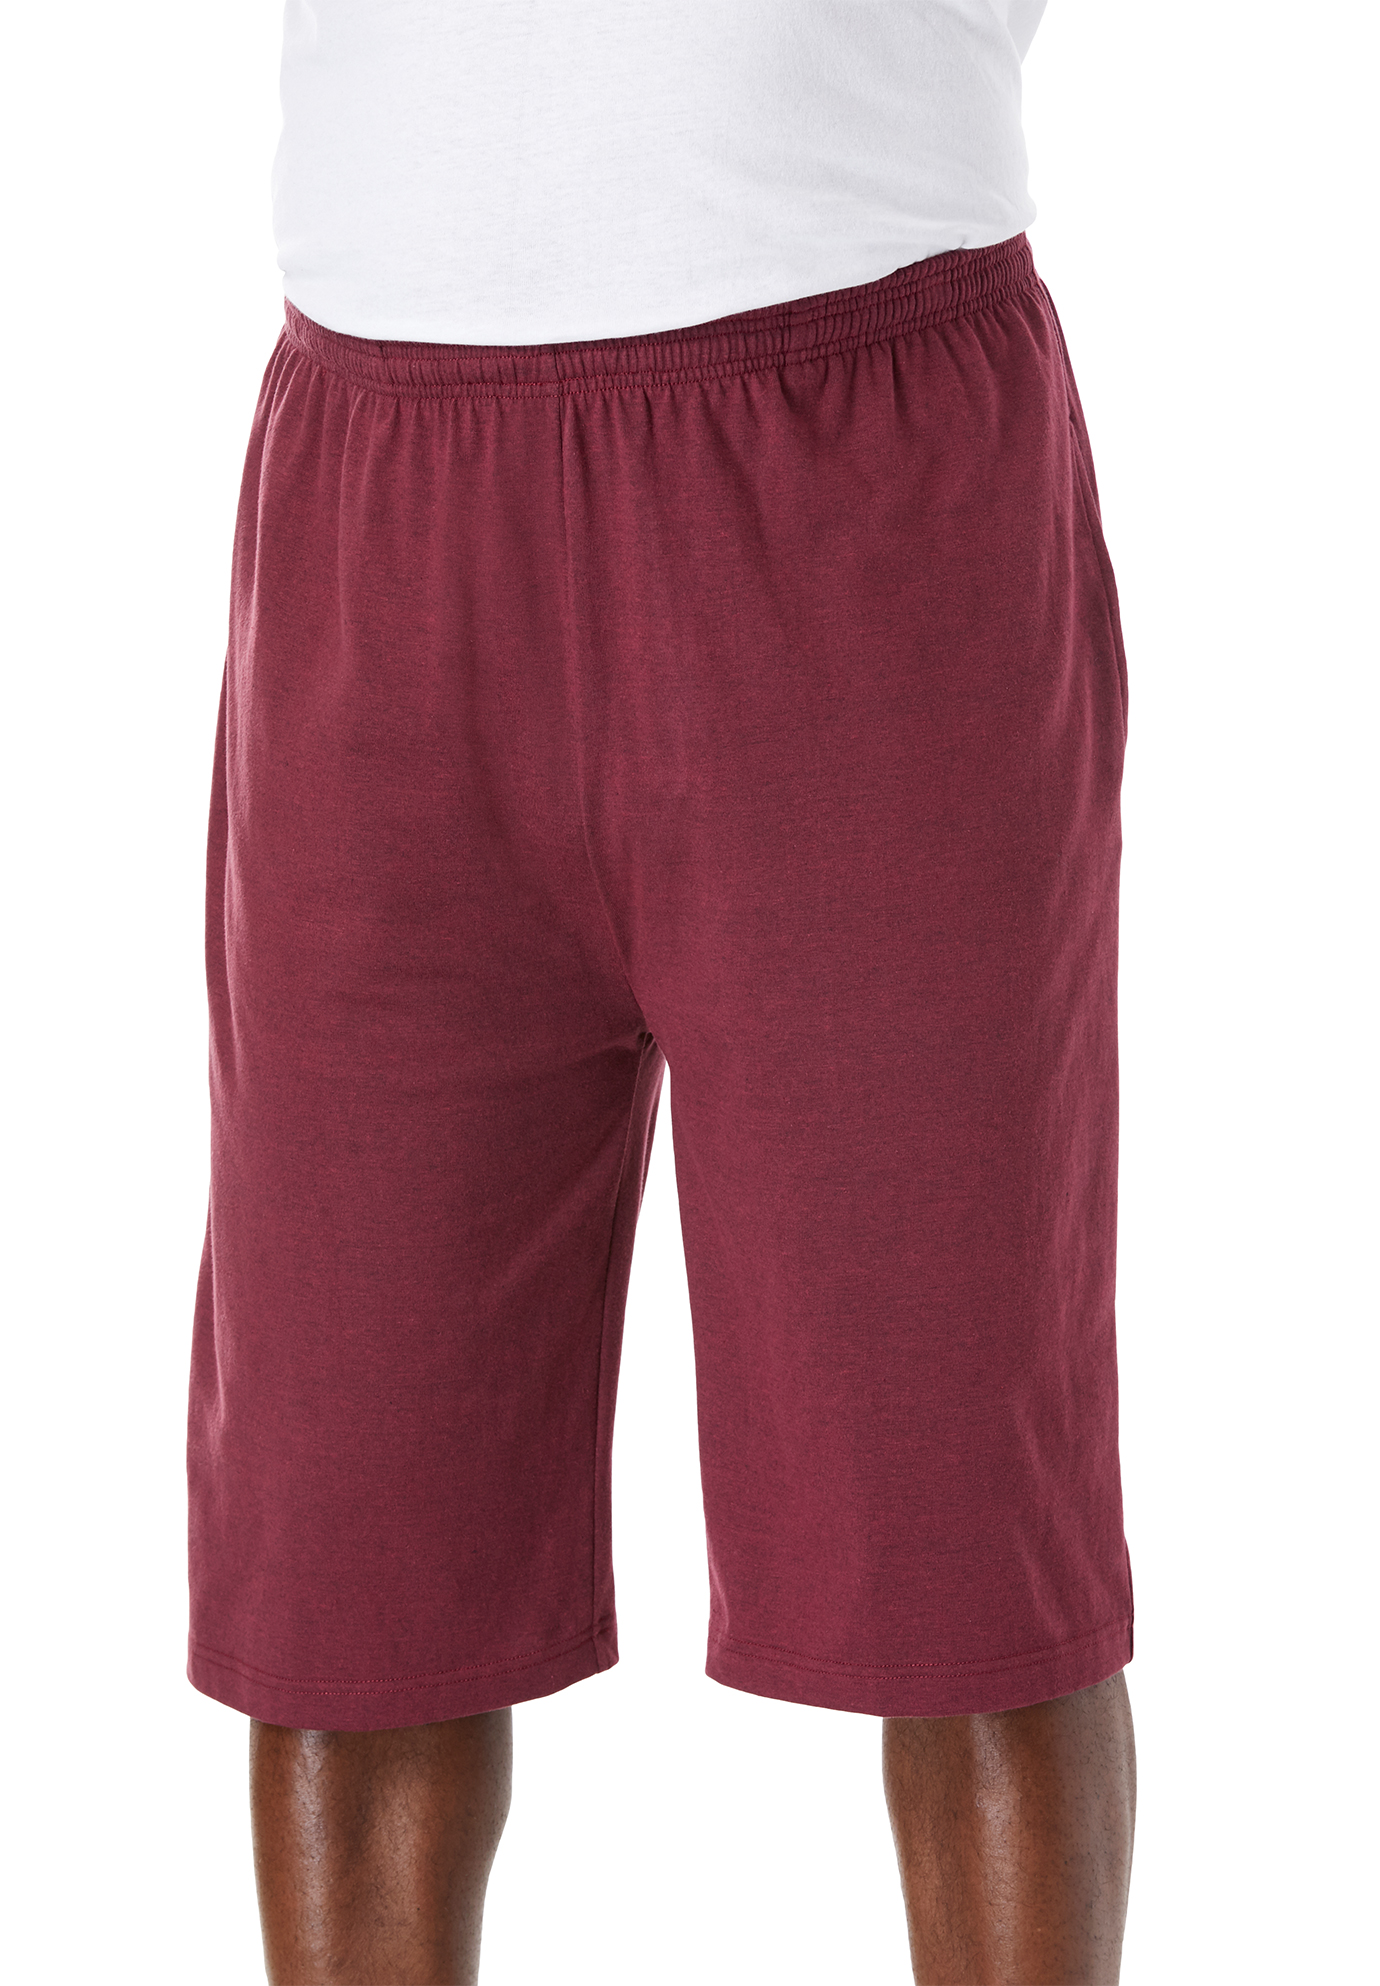 KingSize Mens Big /& Tall Lightweight Extra Long Shorts